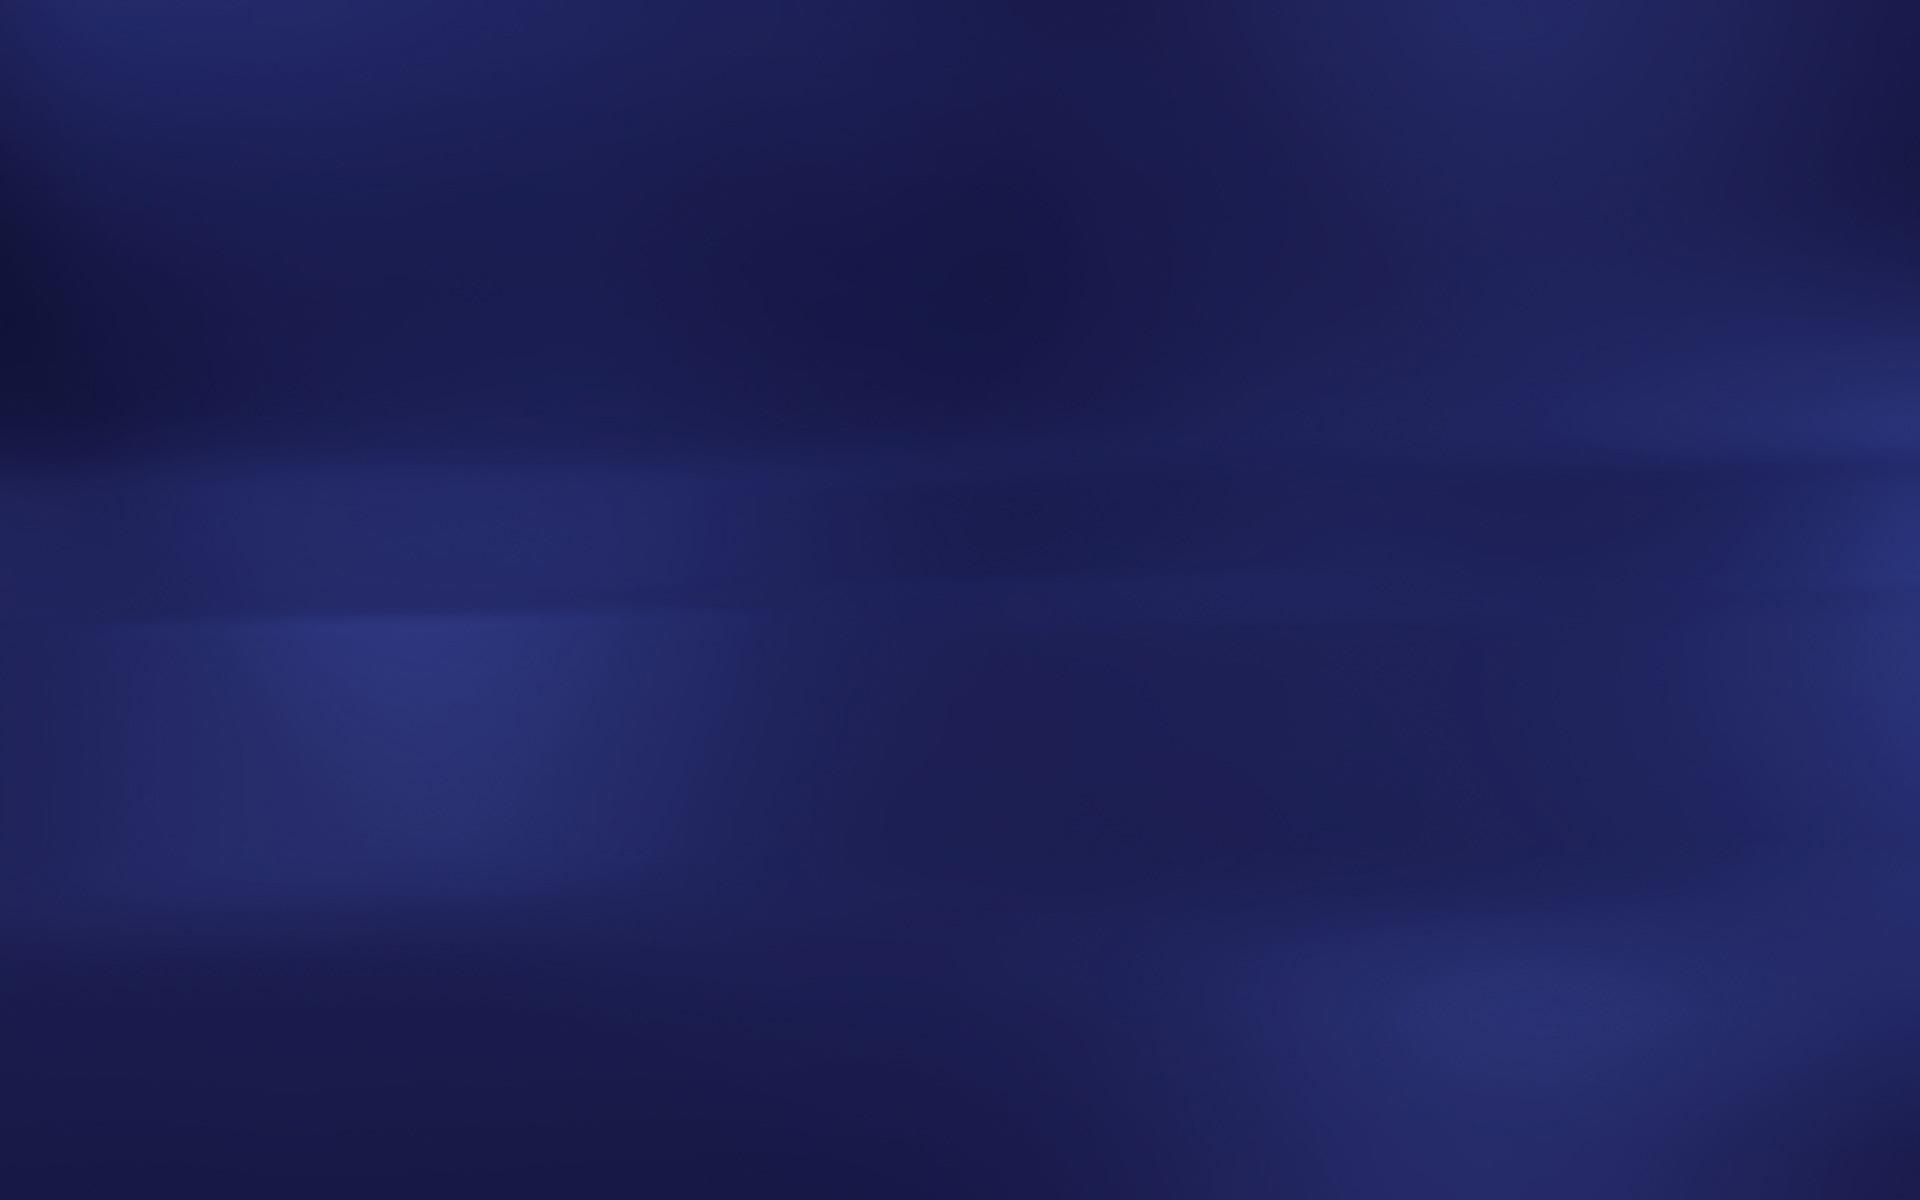 Deep Blue Background   1436723 1920x1200